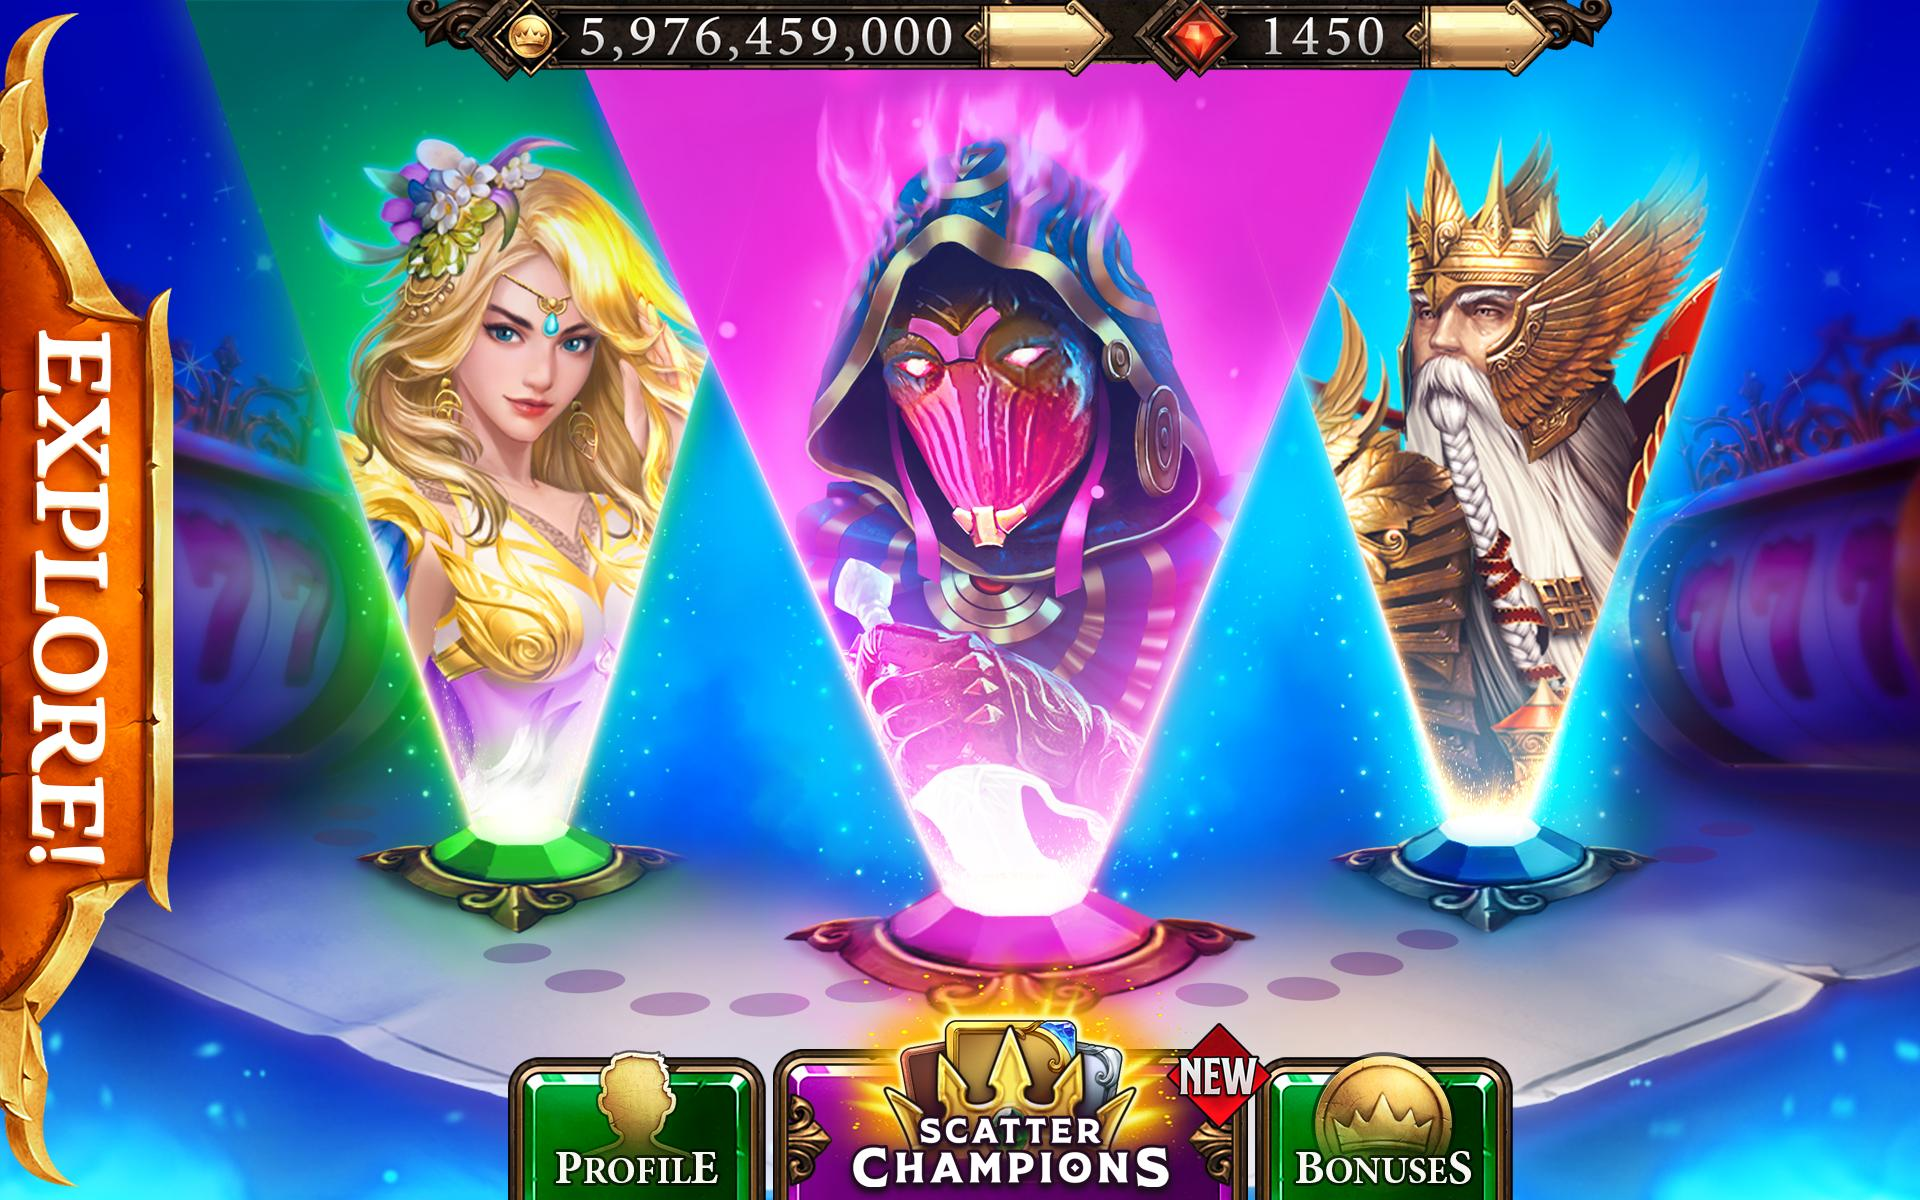 Scatter Slots Las Vegas Casino Game 777 Online 3.87.0 Screenshot 12